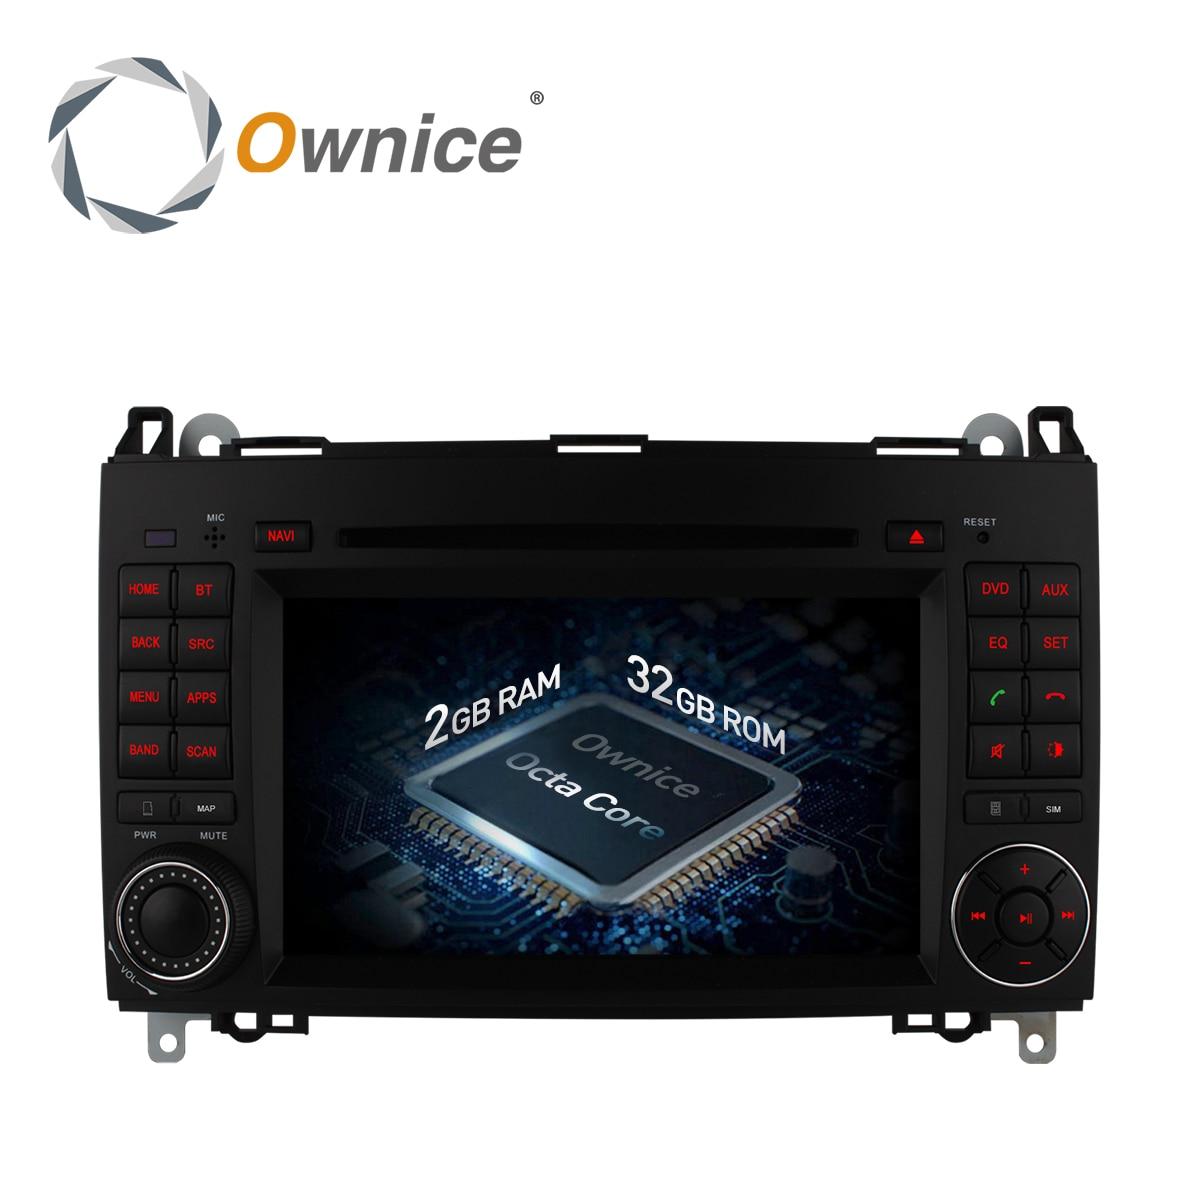 Ownice-reproductor de DVD para coche, Android 6,0, 8 Core, para Mercedes Sprinter W209, W169, W245, Viano, Vito, Clase B, B150, B170, B200, A160, A180, C500